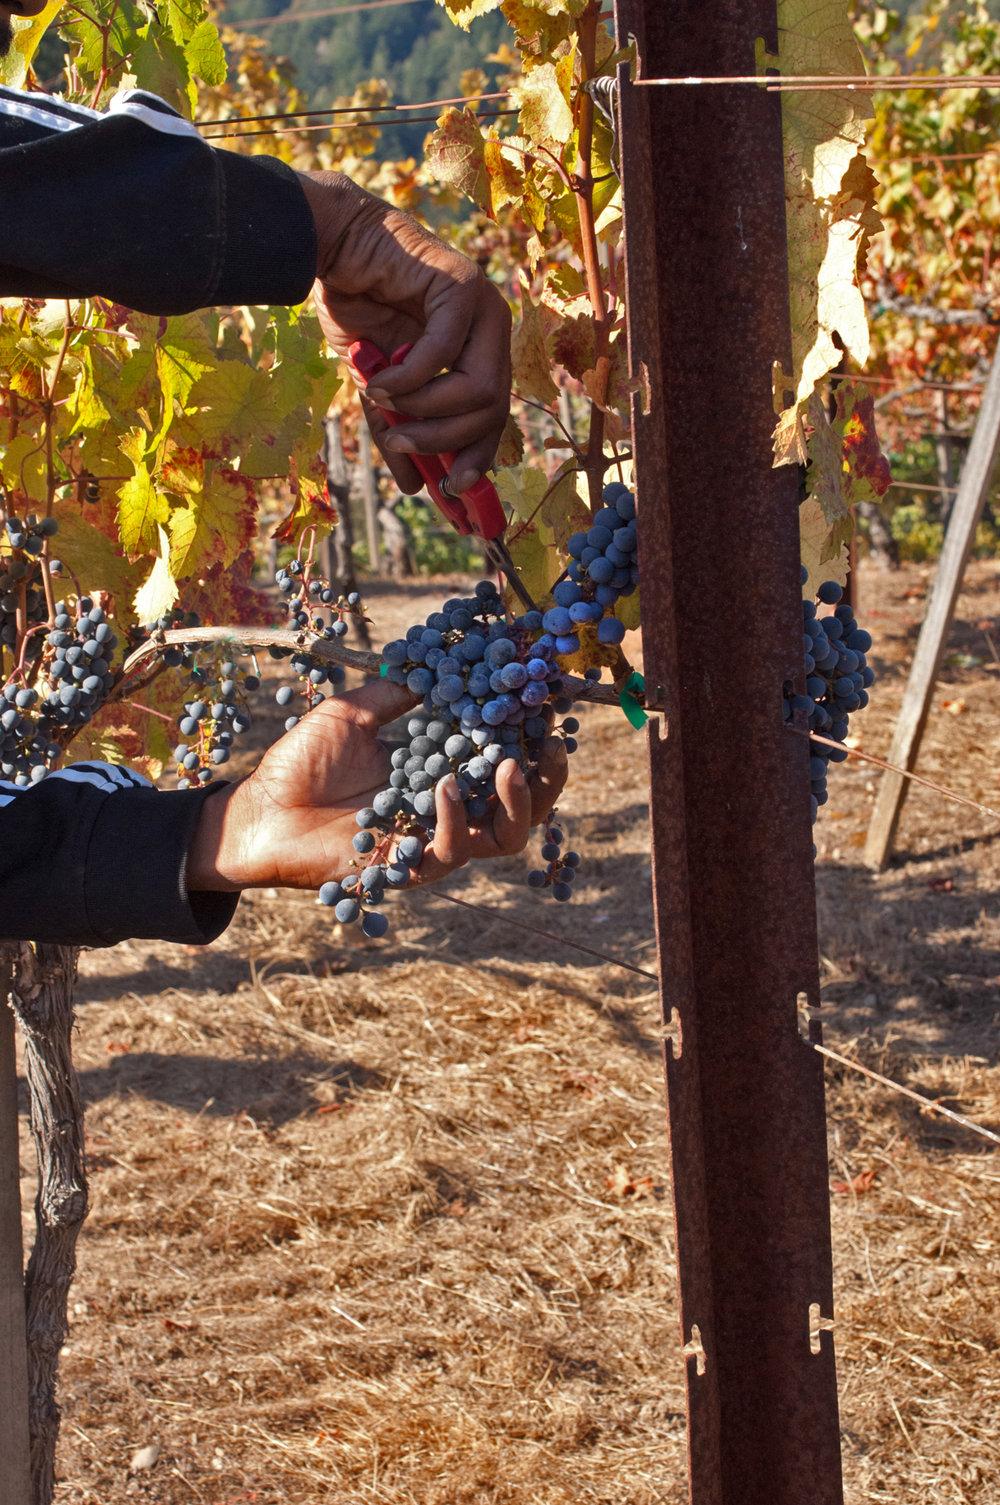 Sav Chan cutting of blue berries